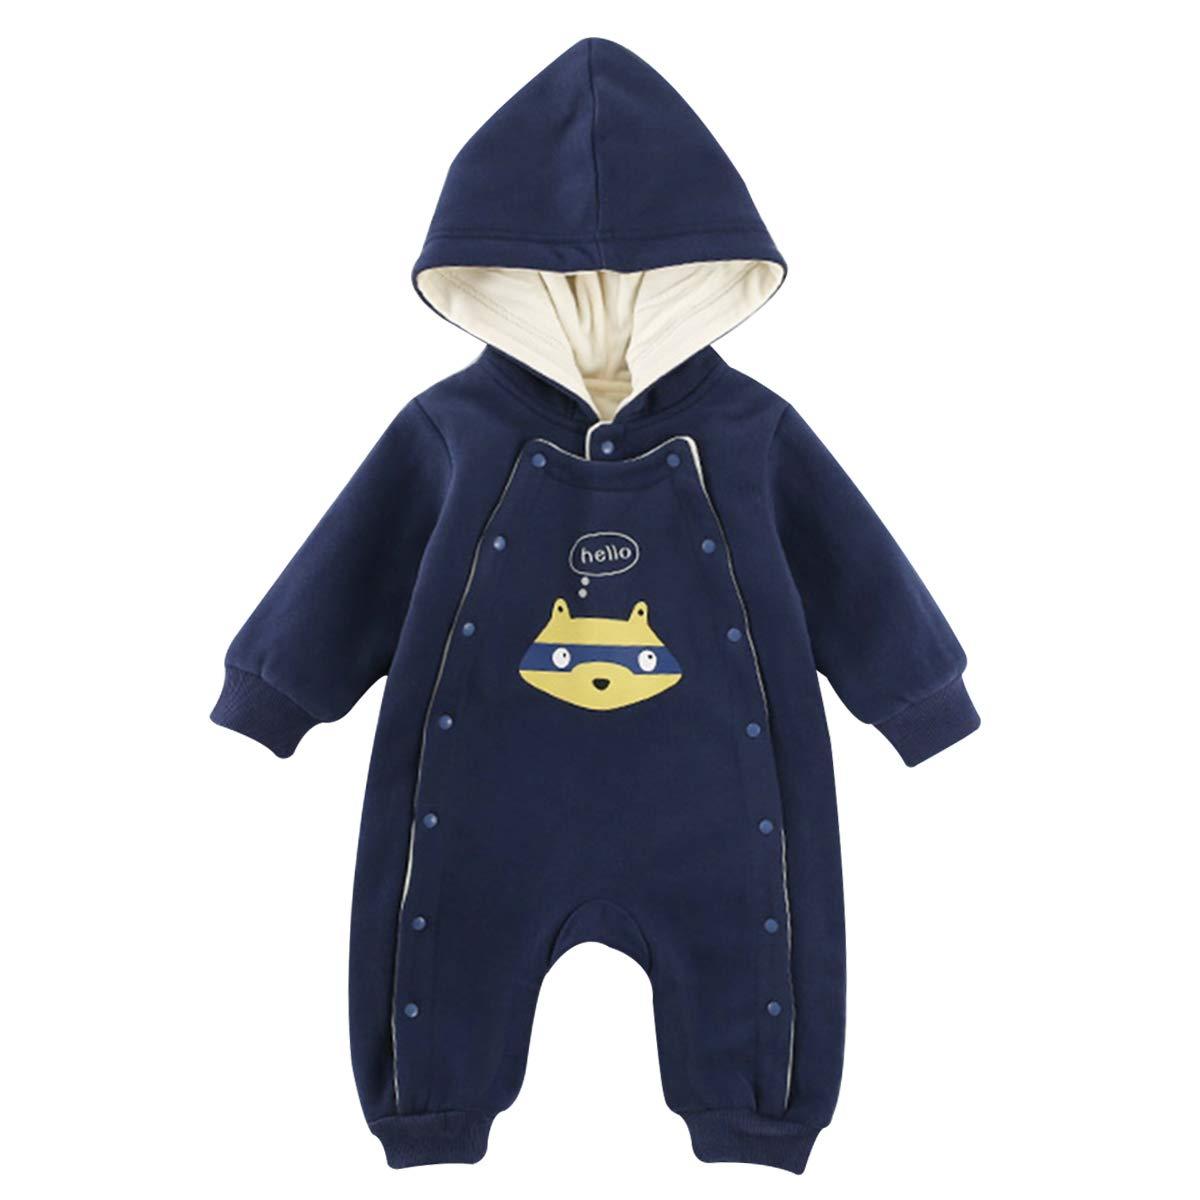 Kanodan Baby Winter Kleidung Jungen Mädchen Strampler Kinder Overall